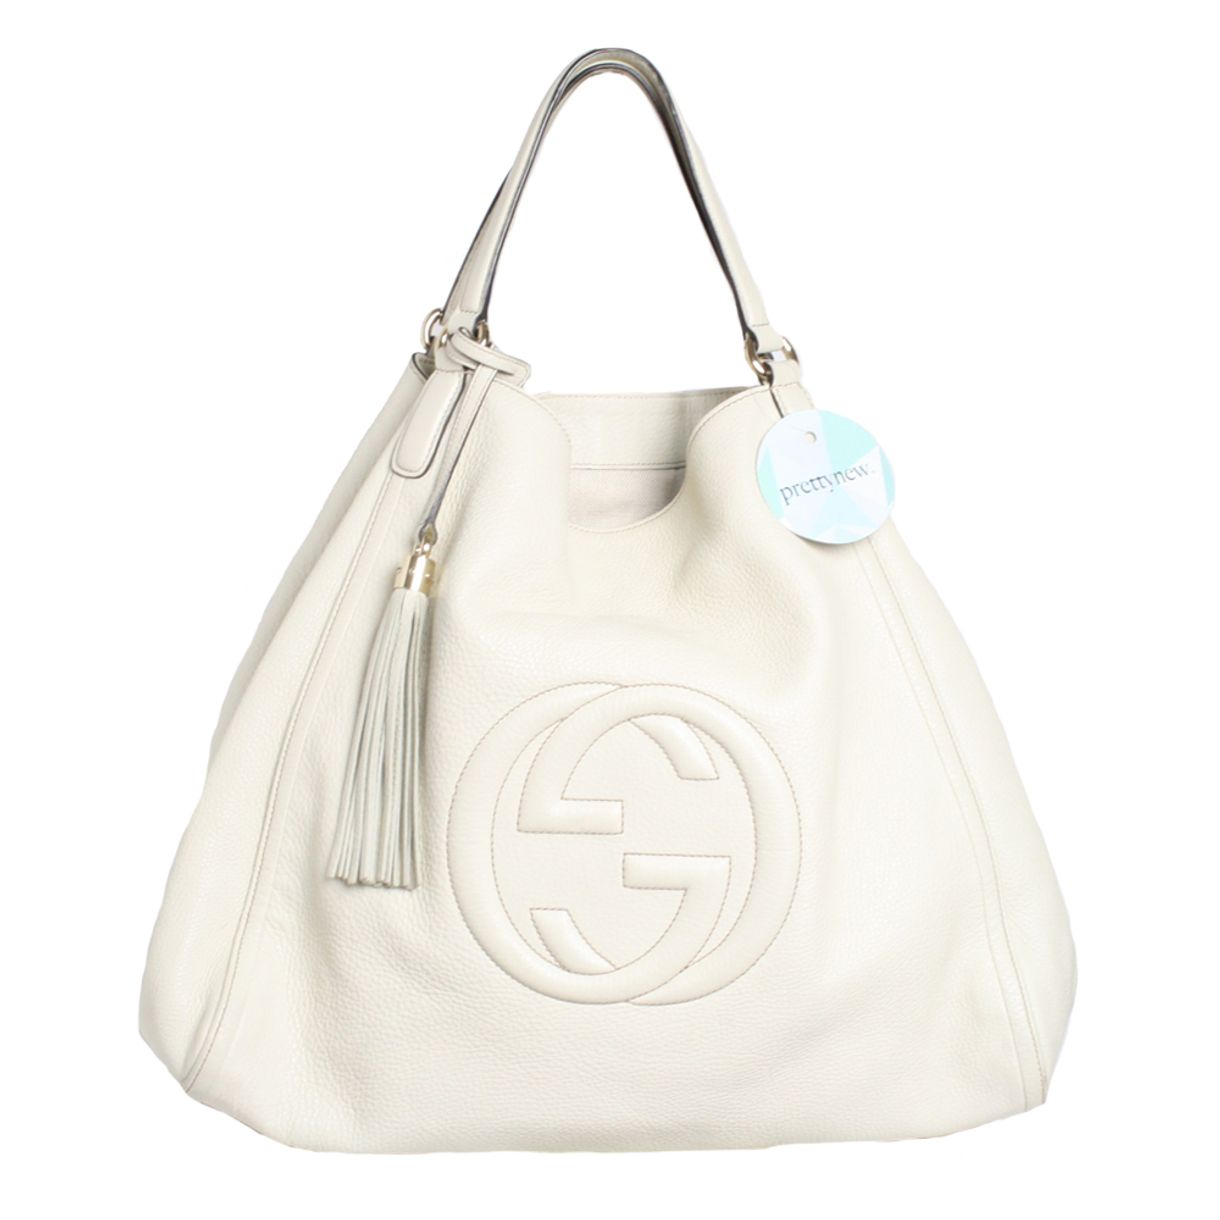 Bolsa-Gucci-Large-Soho-Shoulder-Bag